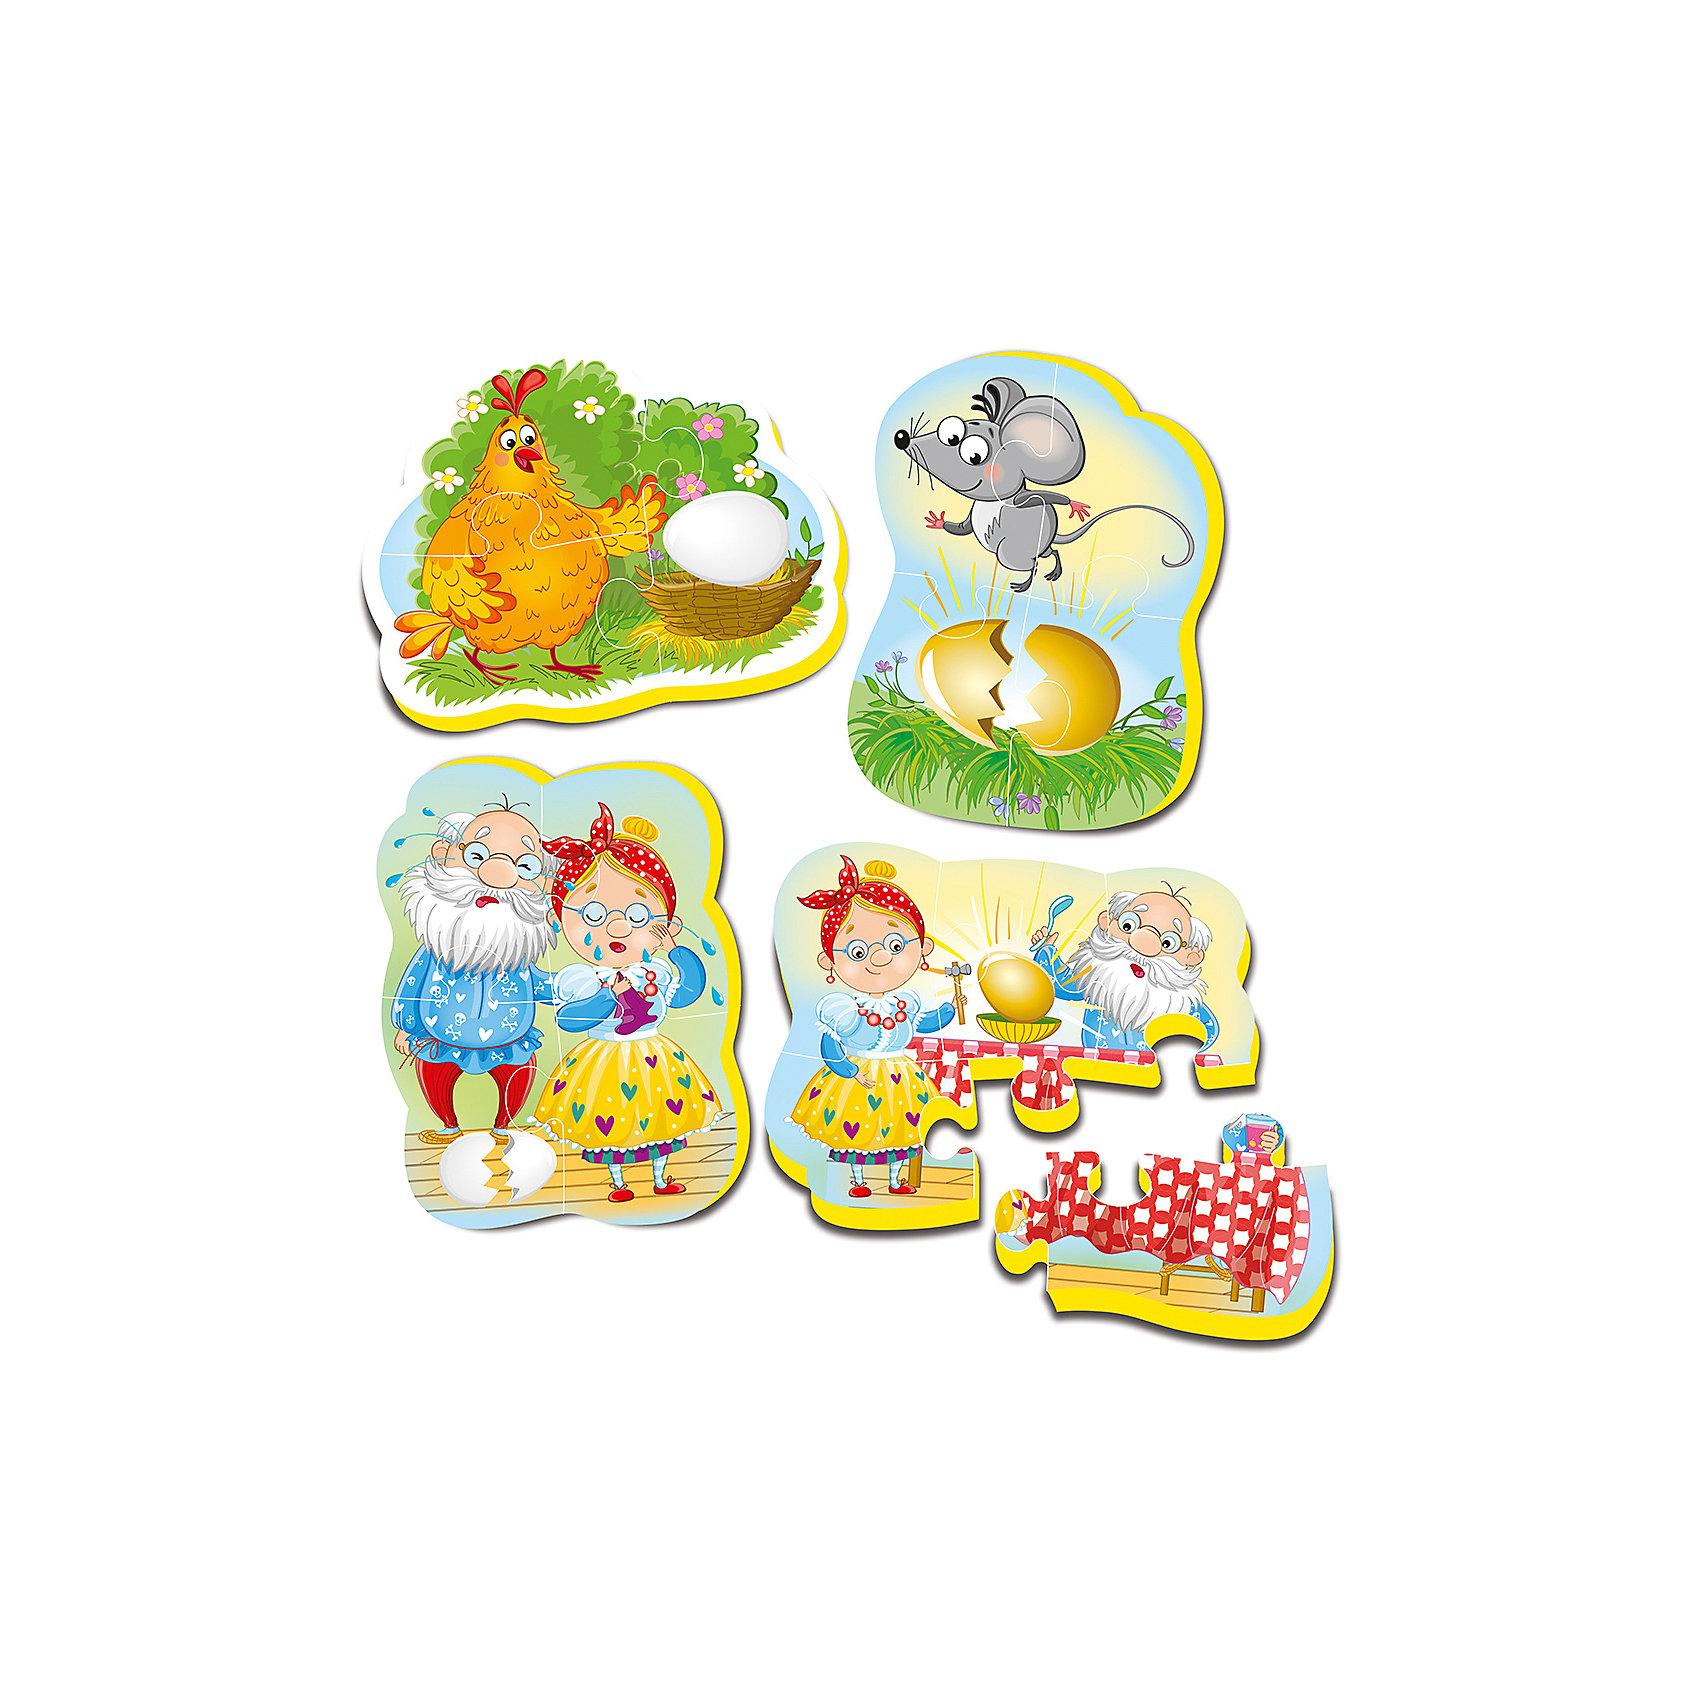 Vladi Toys Мягкие пазлы Три поросенка, Vladi Toys пазлы vladi toys пазлы мягкие baby puzzle сказки репка